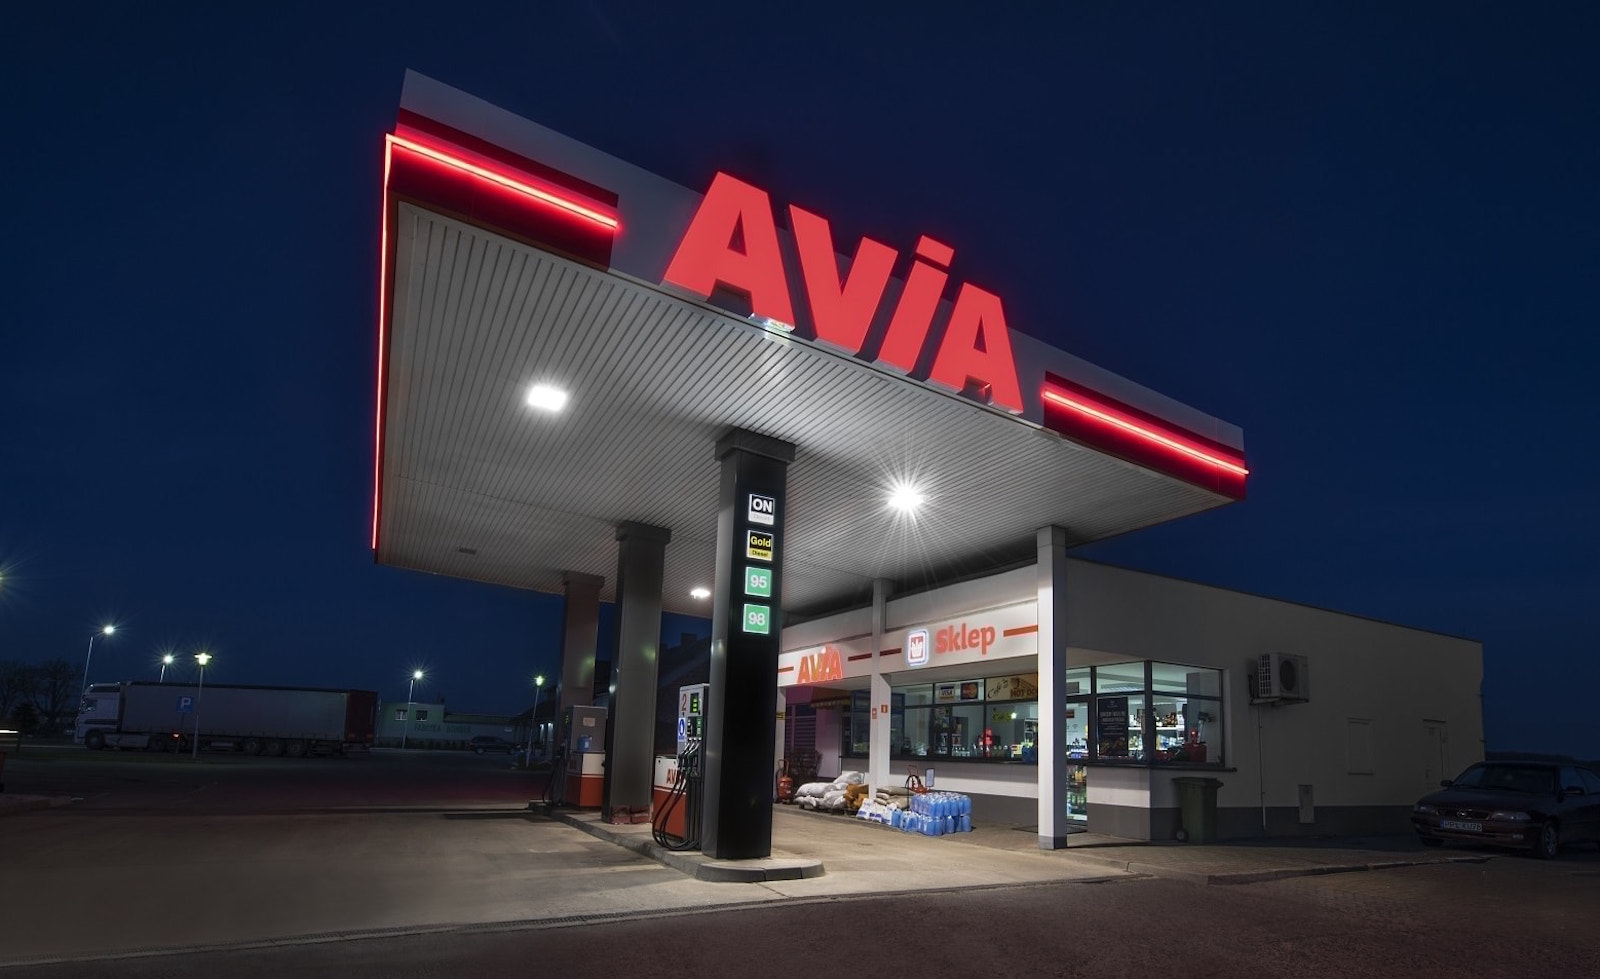 Avia Service